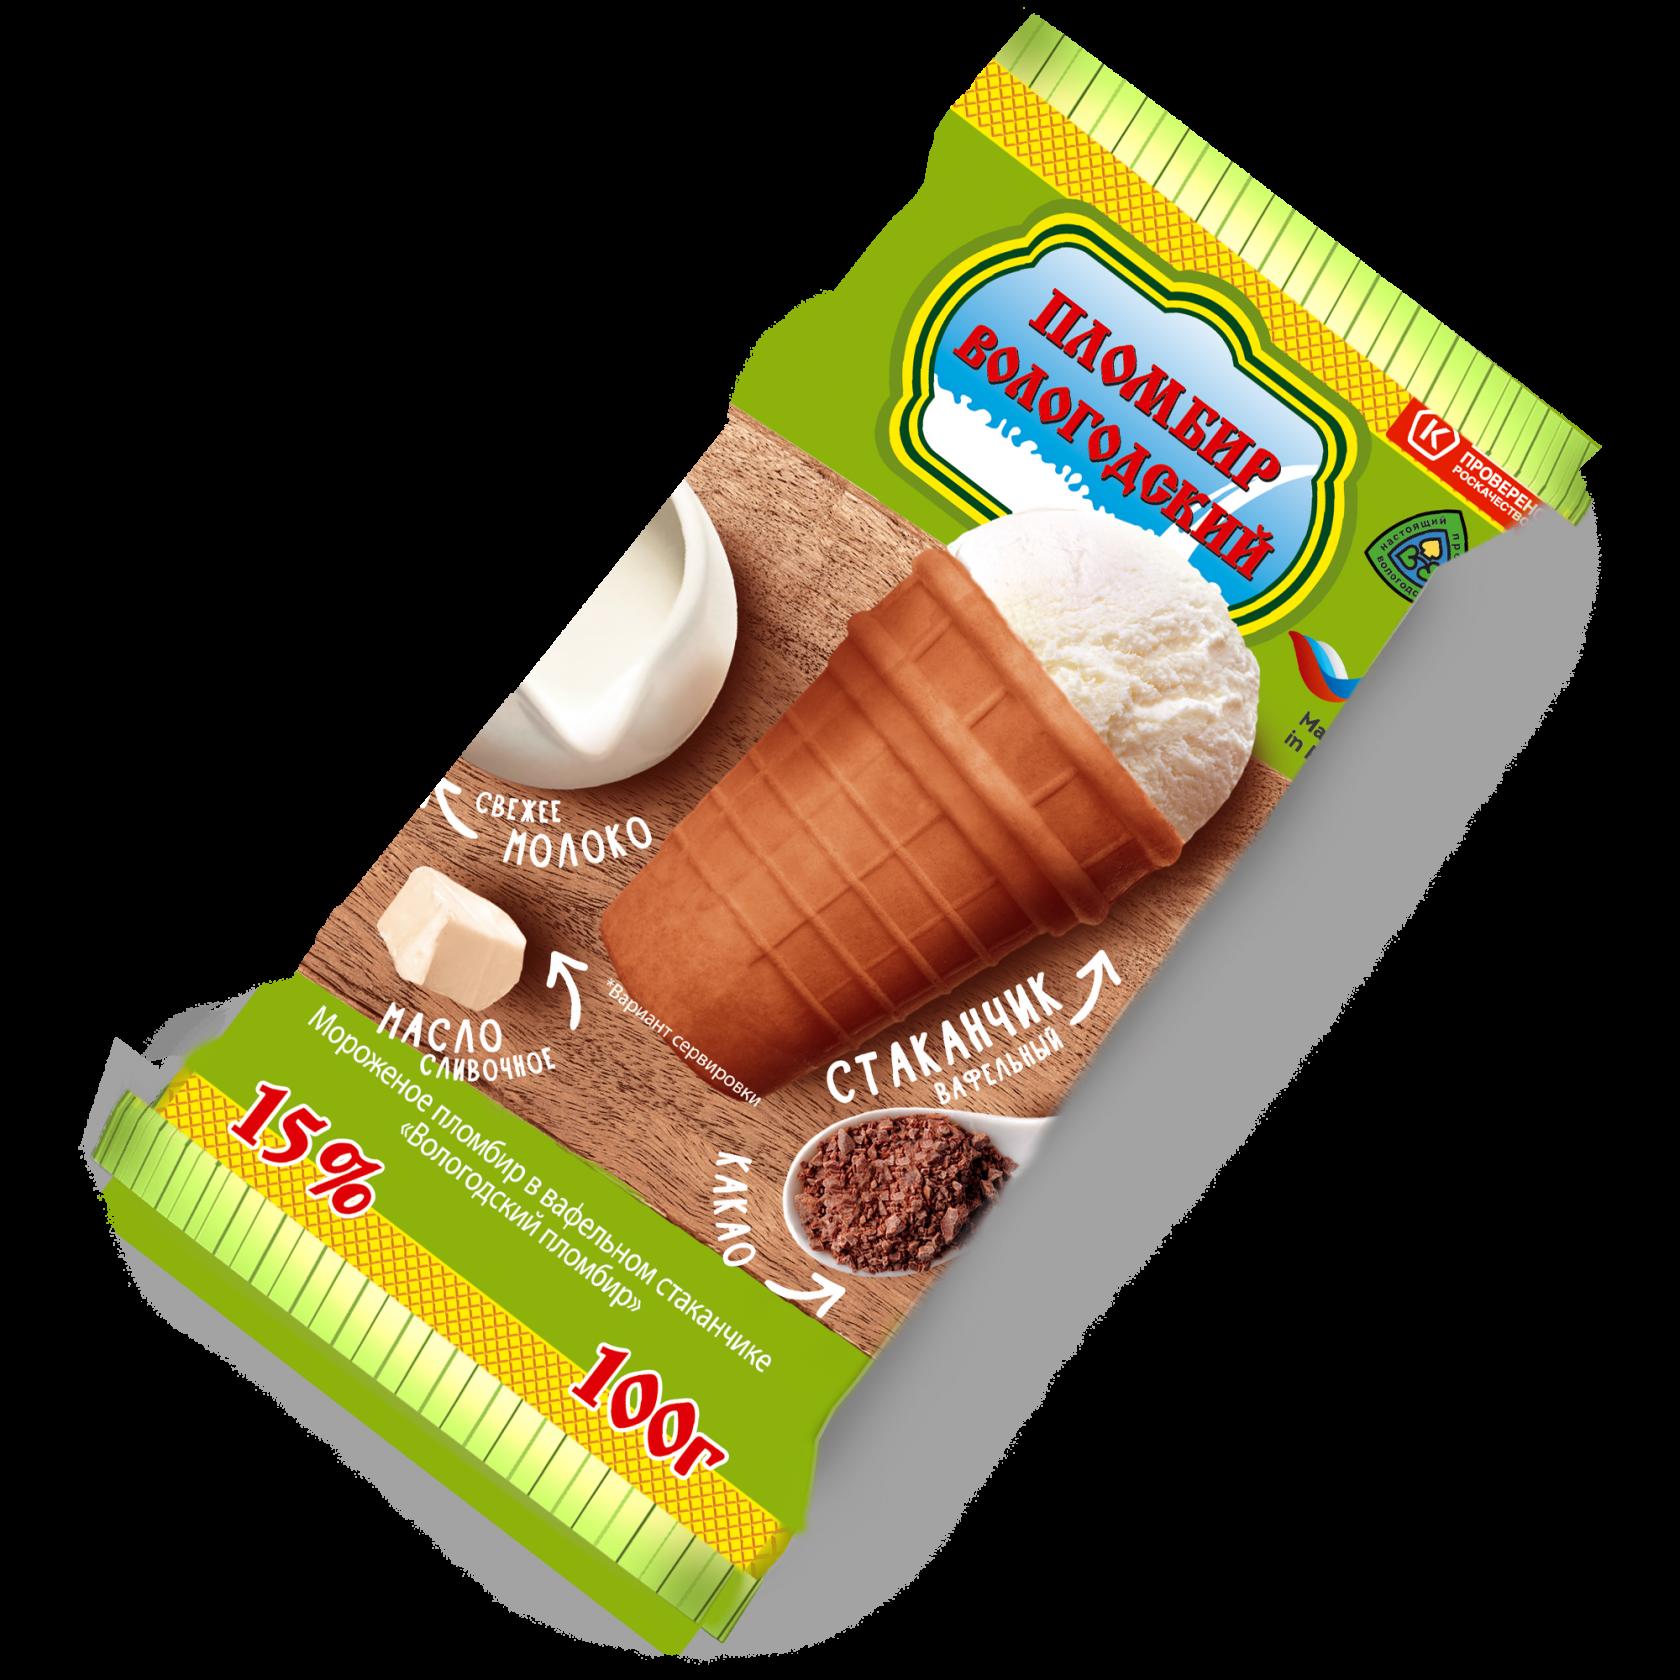 Мороженое Вологодский пломбир ст.ваниль 100гр.